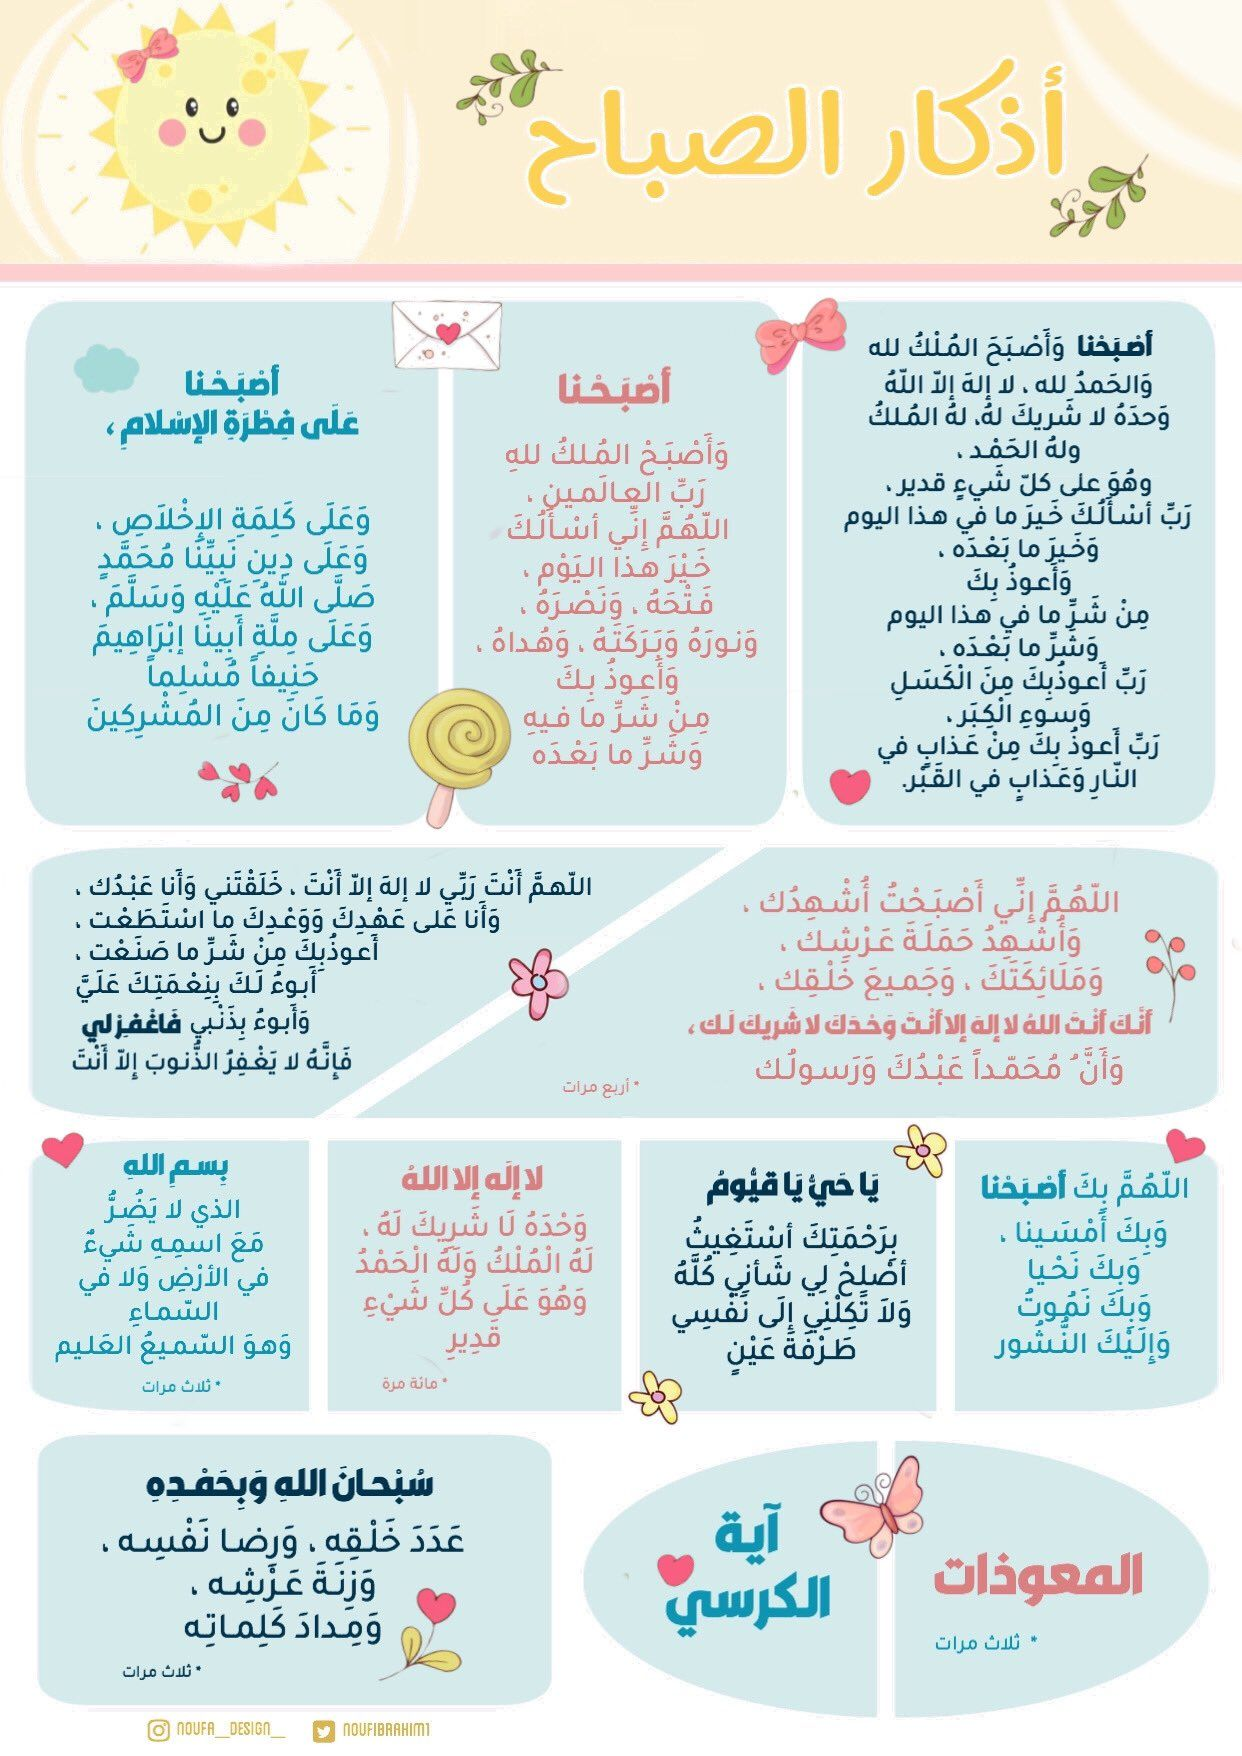 أذكار الصباح Islamic Quotes Wallpaper Islamic Love Quotes Learn Islam